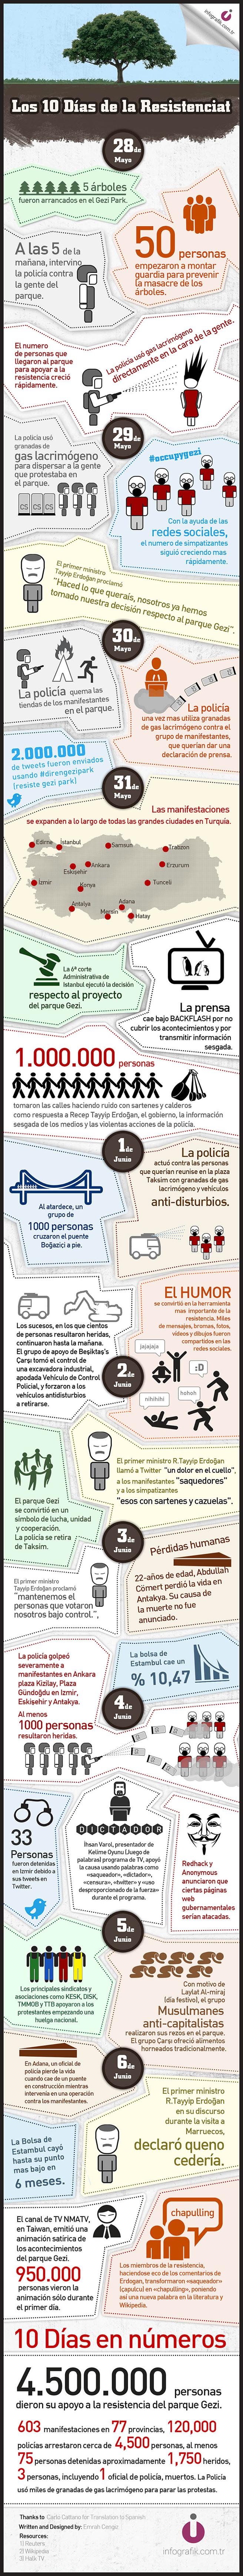 Gezi Parki Infographic Espanol